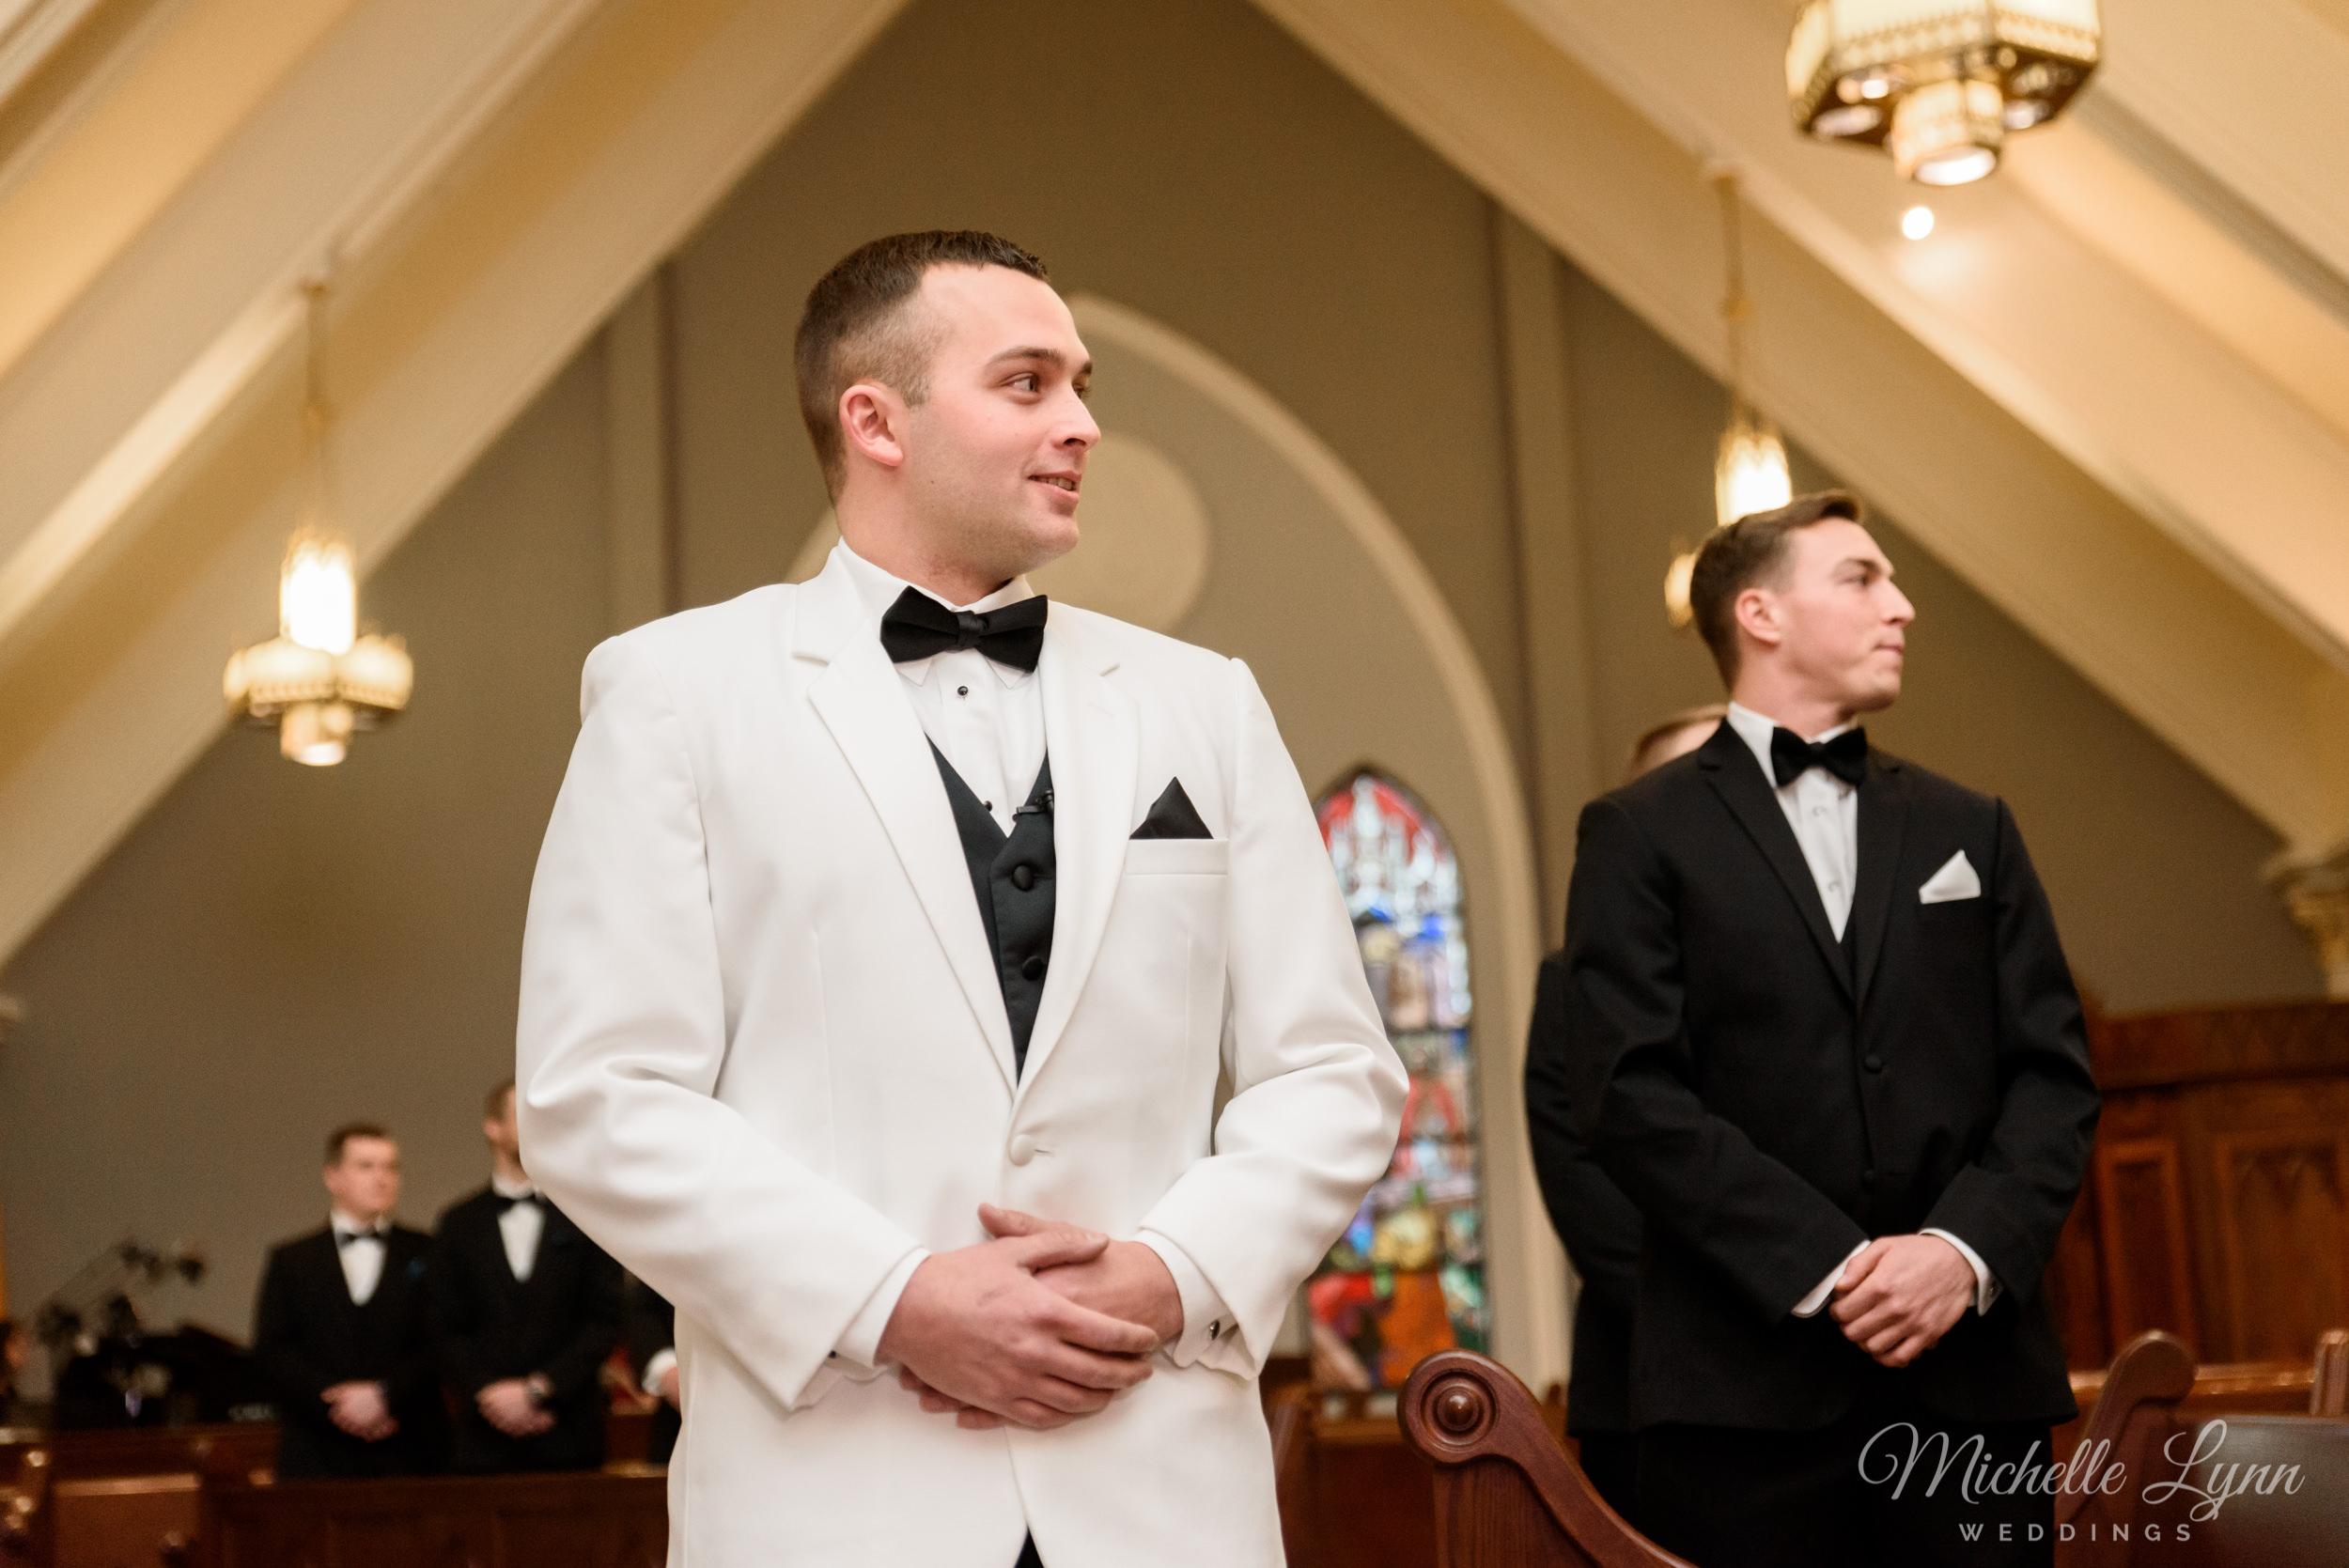 william-penn-inn-wedding-photography-mlw-48.jpg